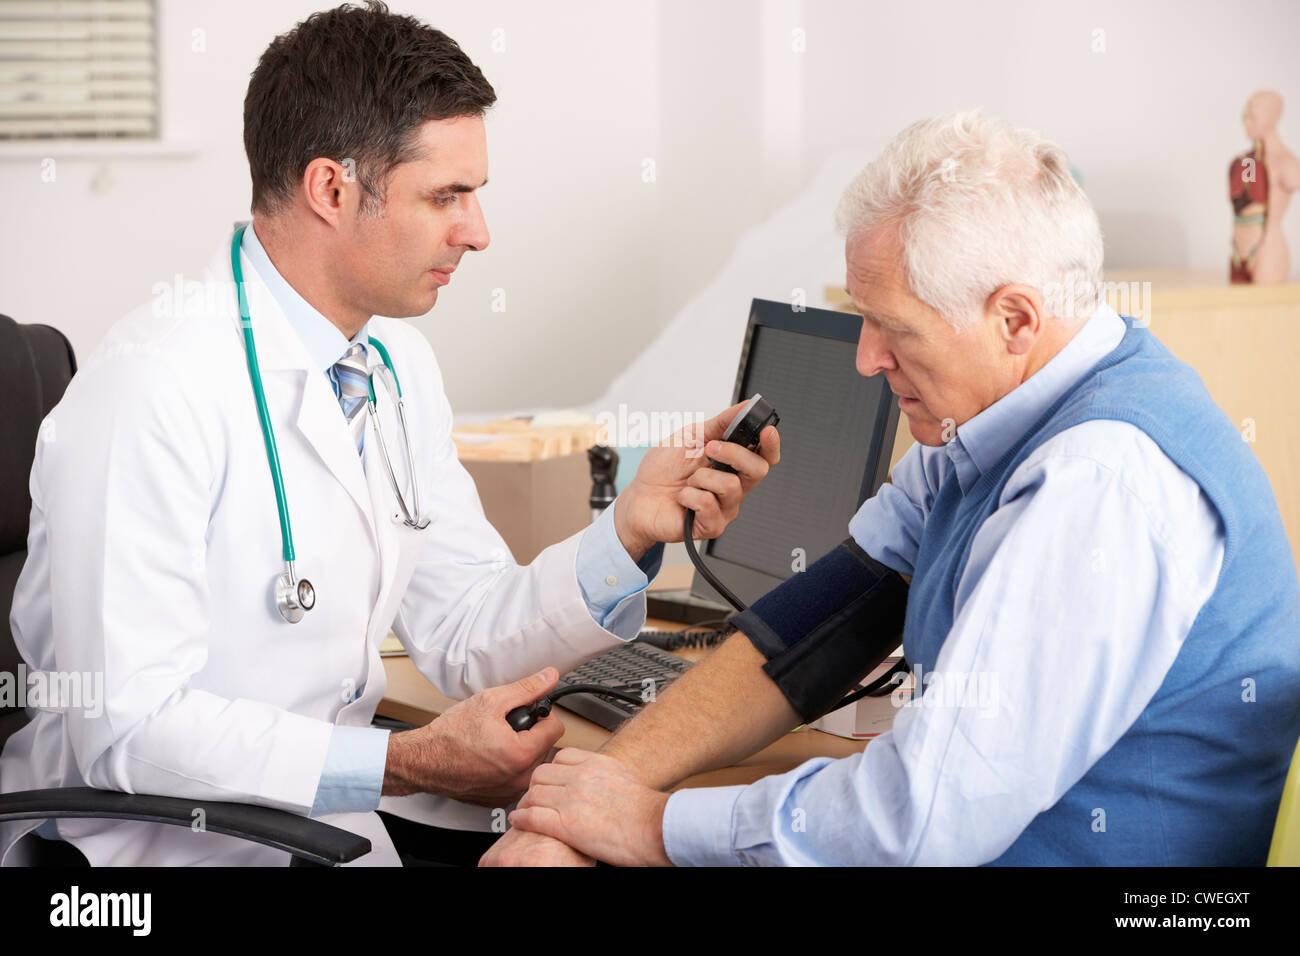 American doctor taking senior man's blood pressure - Stock Image